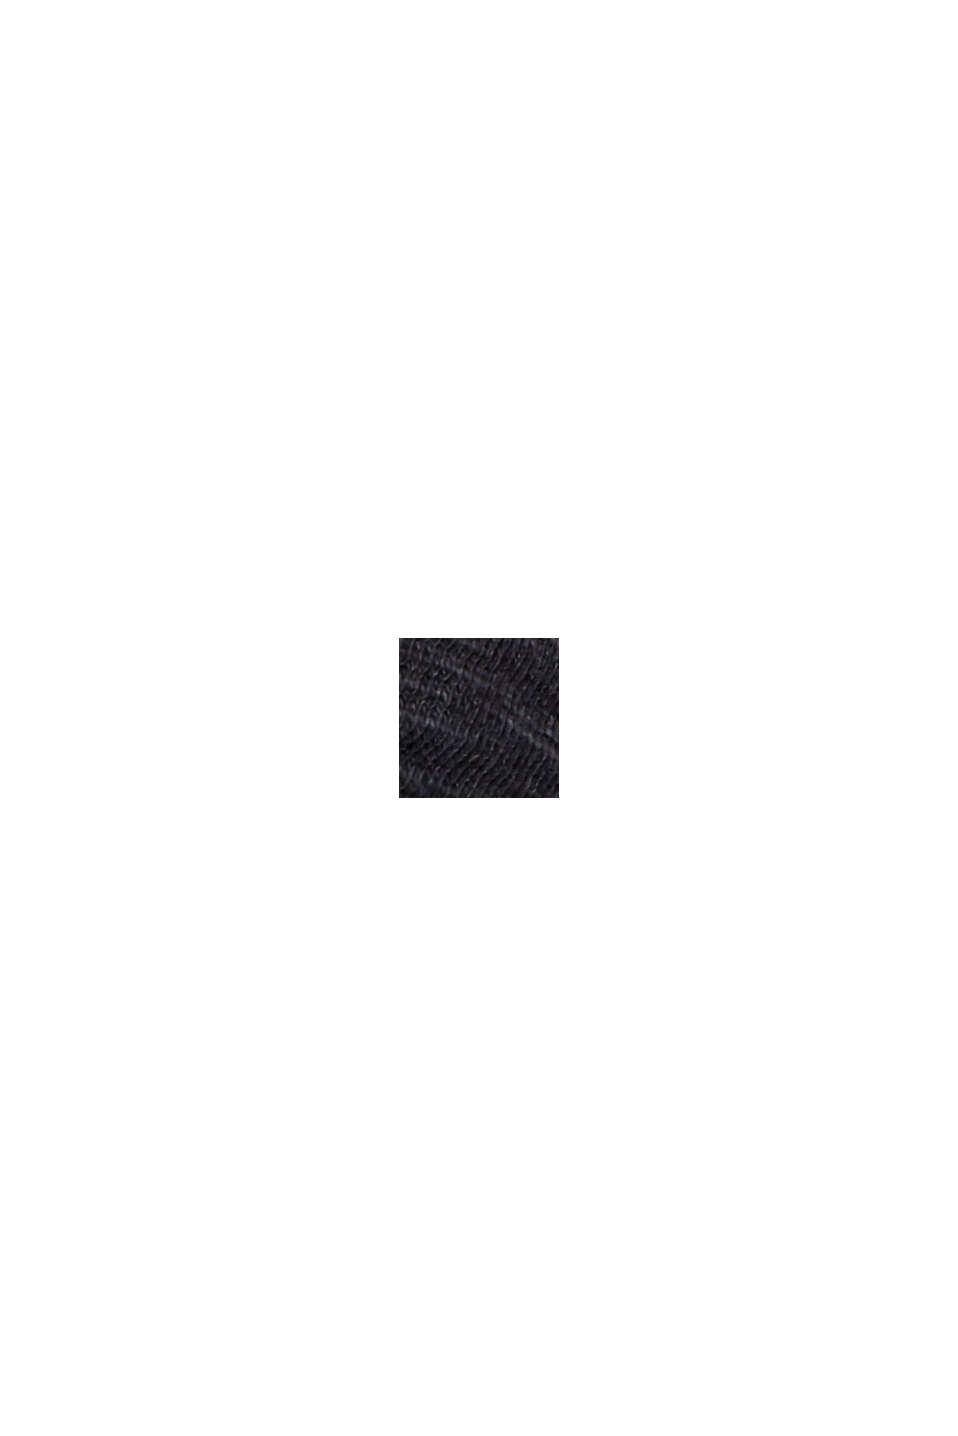 Camiseta con ribetes, 100 % algodón ecológico, BLACK, swatch